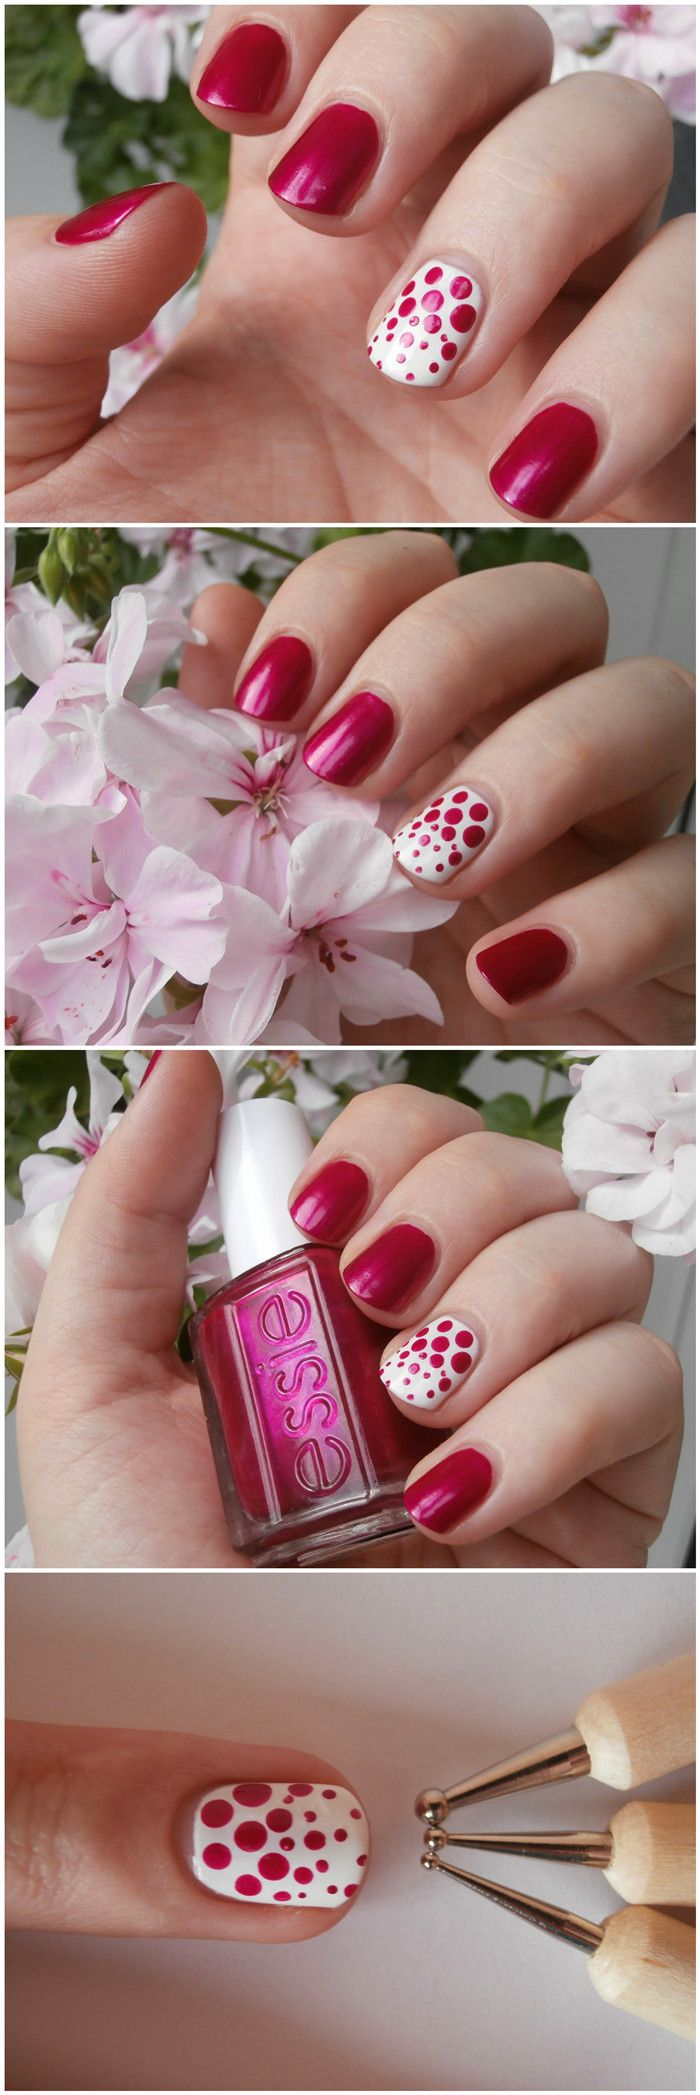 25 beautiful nail art pen ideas on pinterest coral nail designs 403 5pcs 2 way wooden dotting pen marbleizing tool nail art dot bornprettystore prinsesfo Image collections